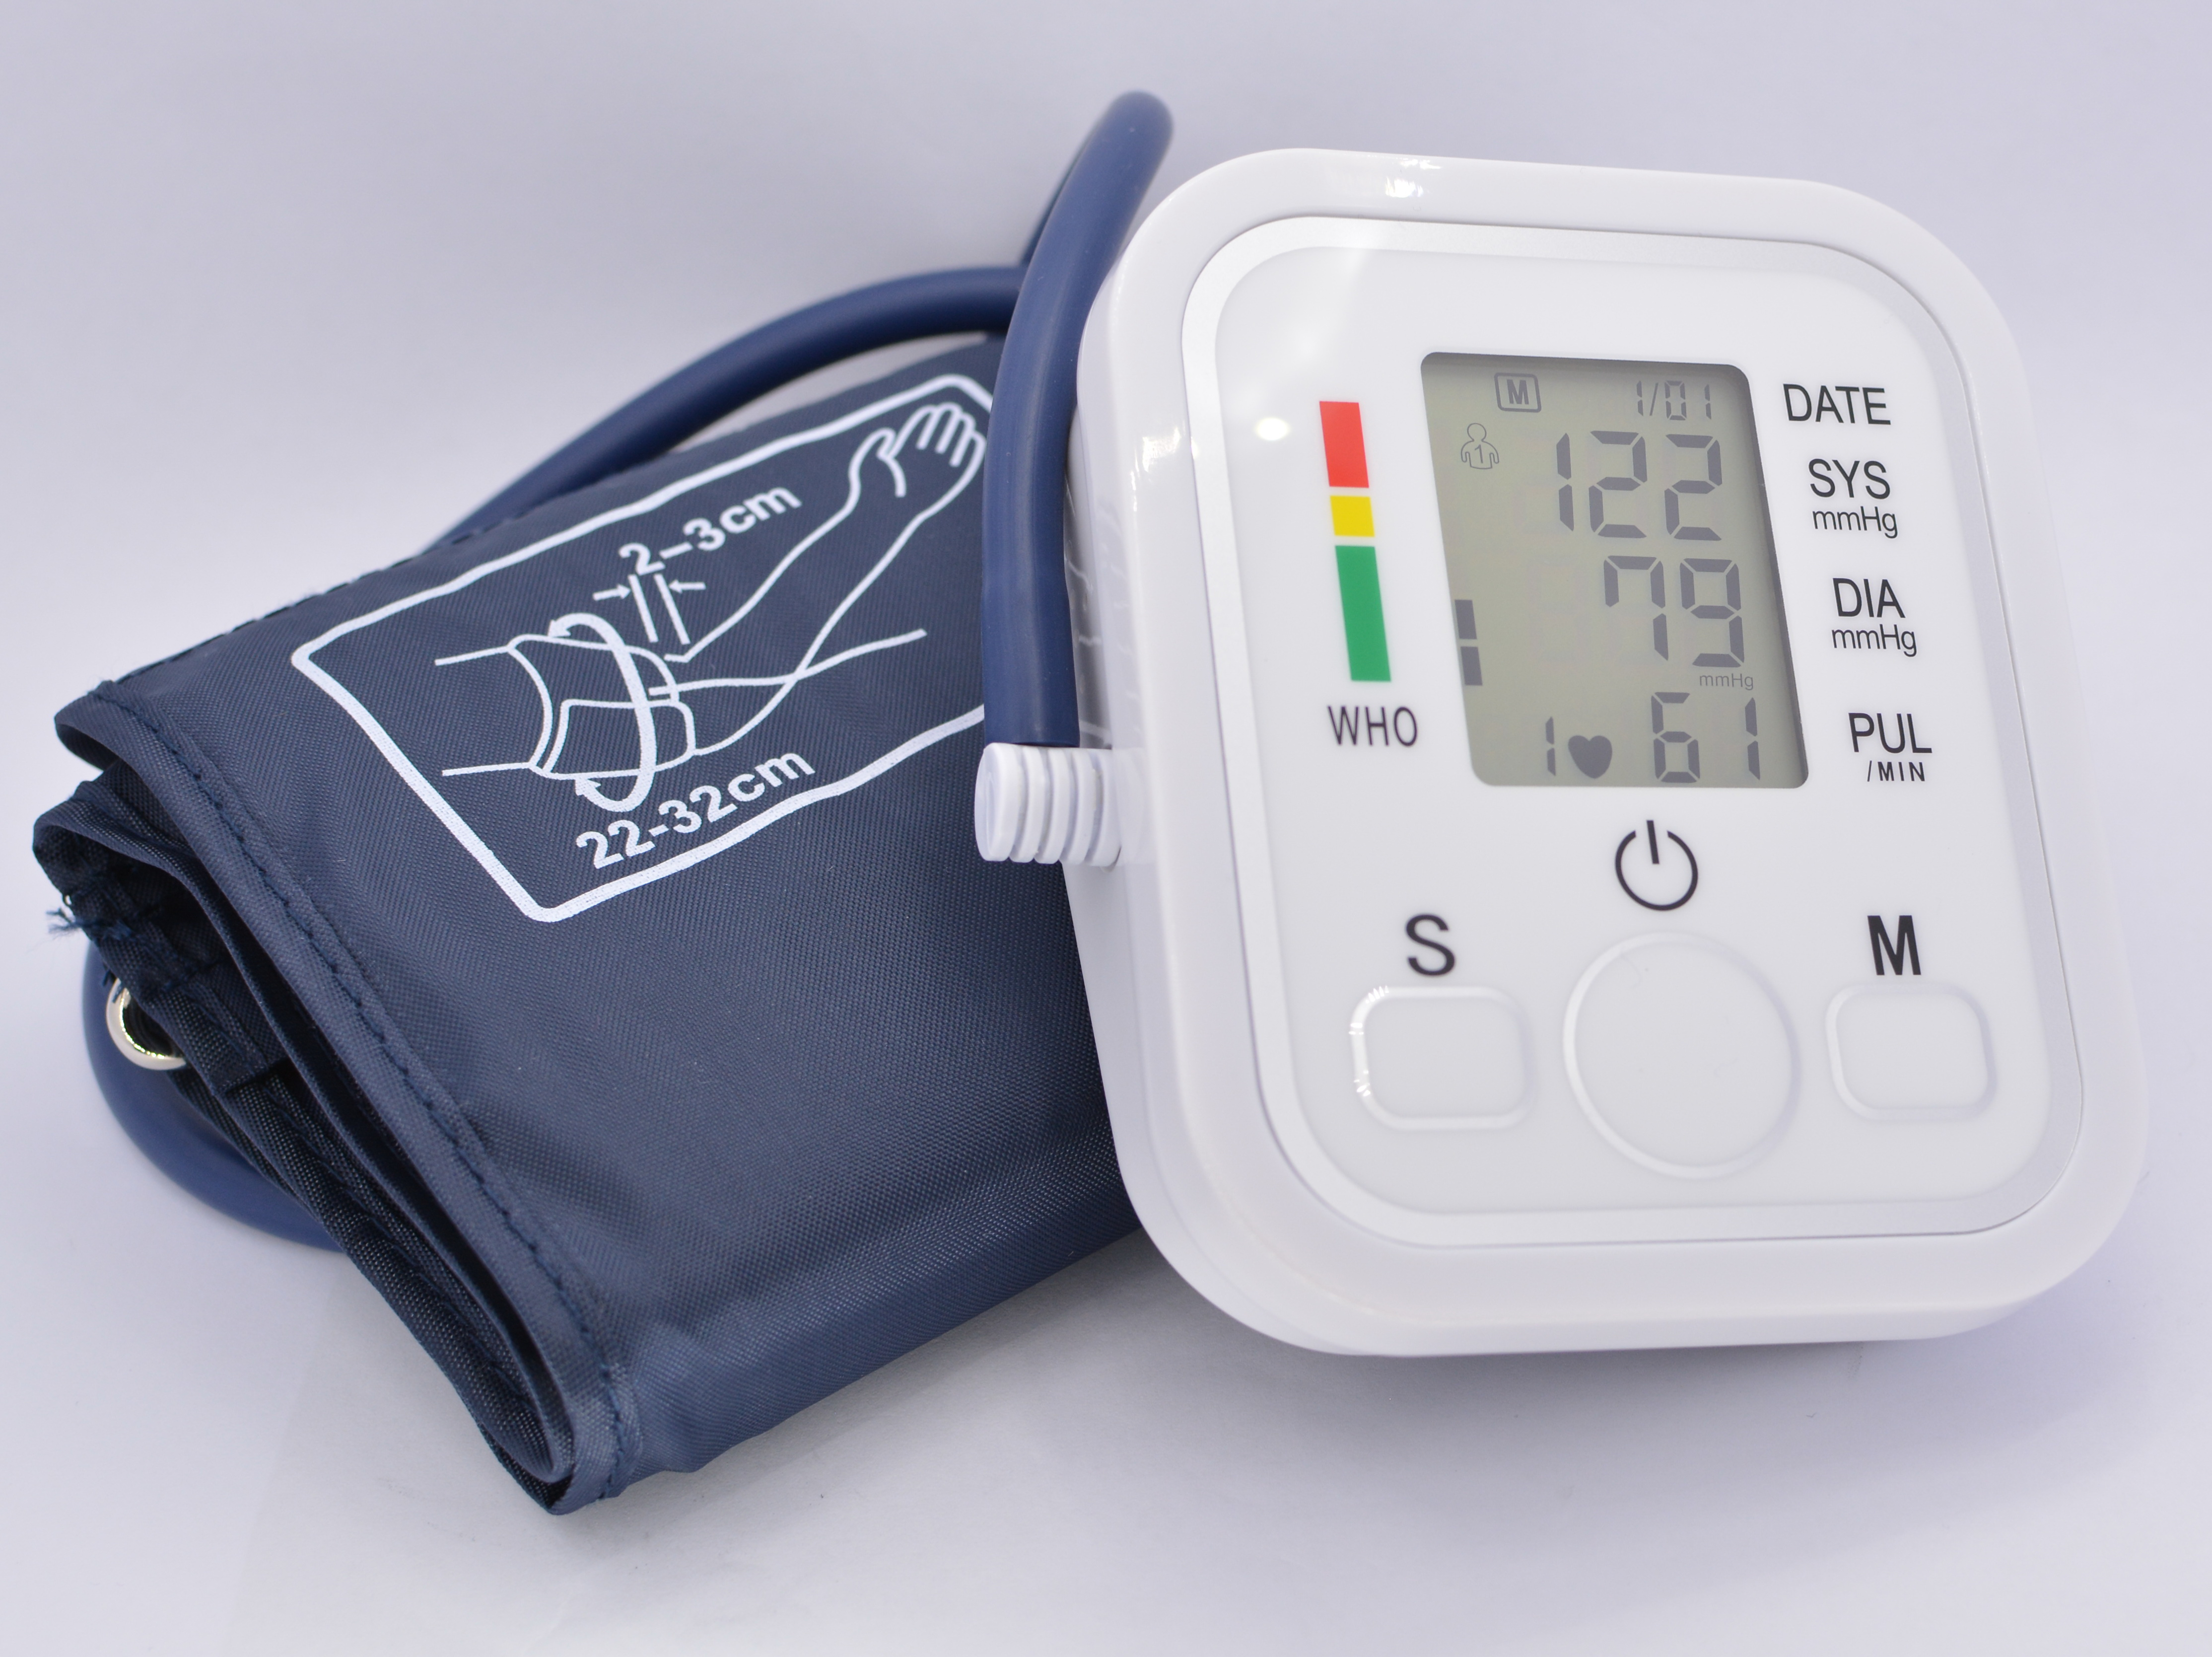 Tensiometru de brat Optimus AT RZ202 automat, oscilometric, manseta 22-32 cm, alimentare la priza / baterii 4xAAA, 2 utilizatori x 99 memorii, 40-280 mmHg, 40-199 bpm [0]